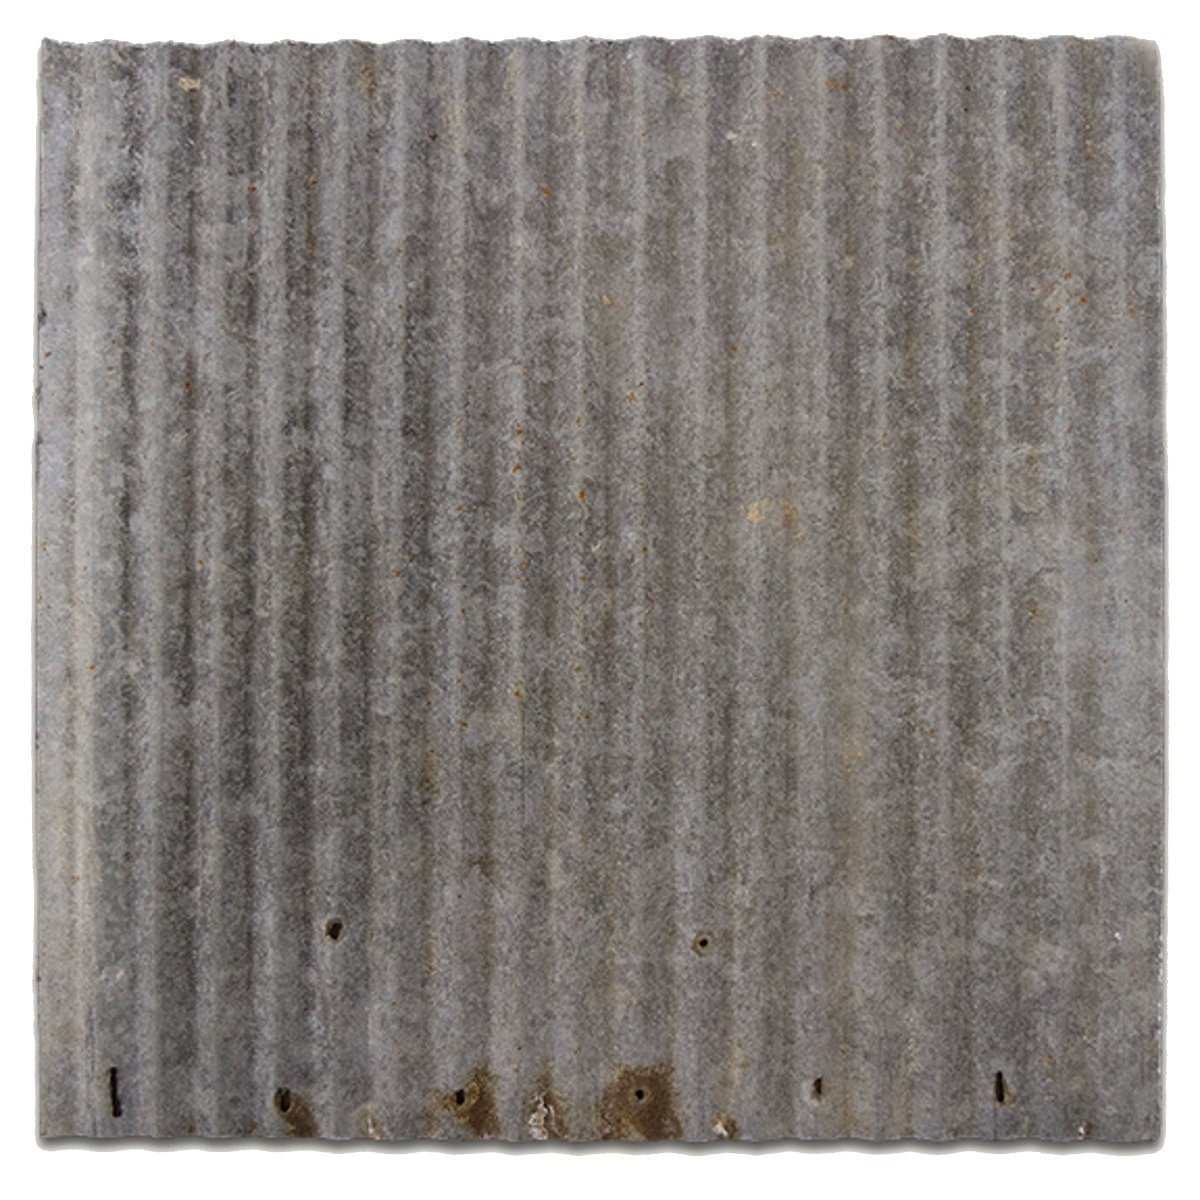 CeilingConnex Upcycled 2'x2' Dakota Barn Tin Ceiling Tile - Marjority Galvanized - Works with Standard Drop Grid